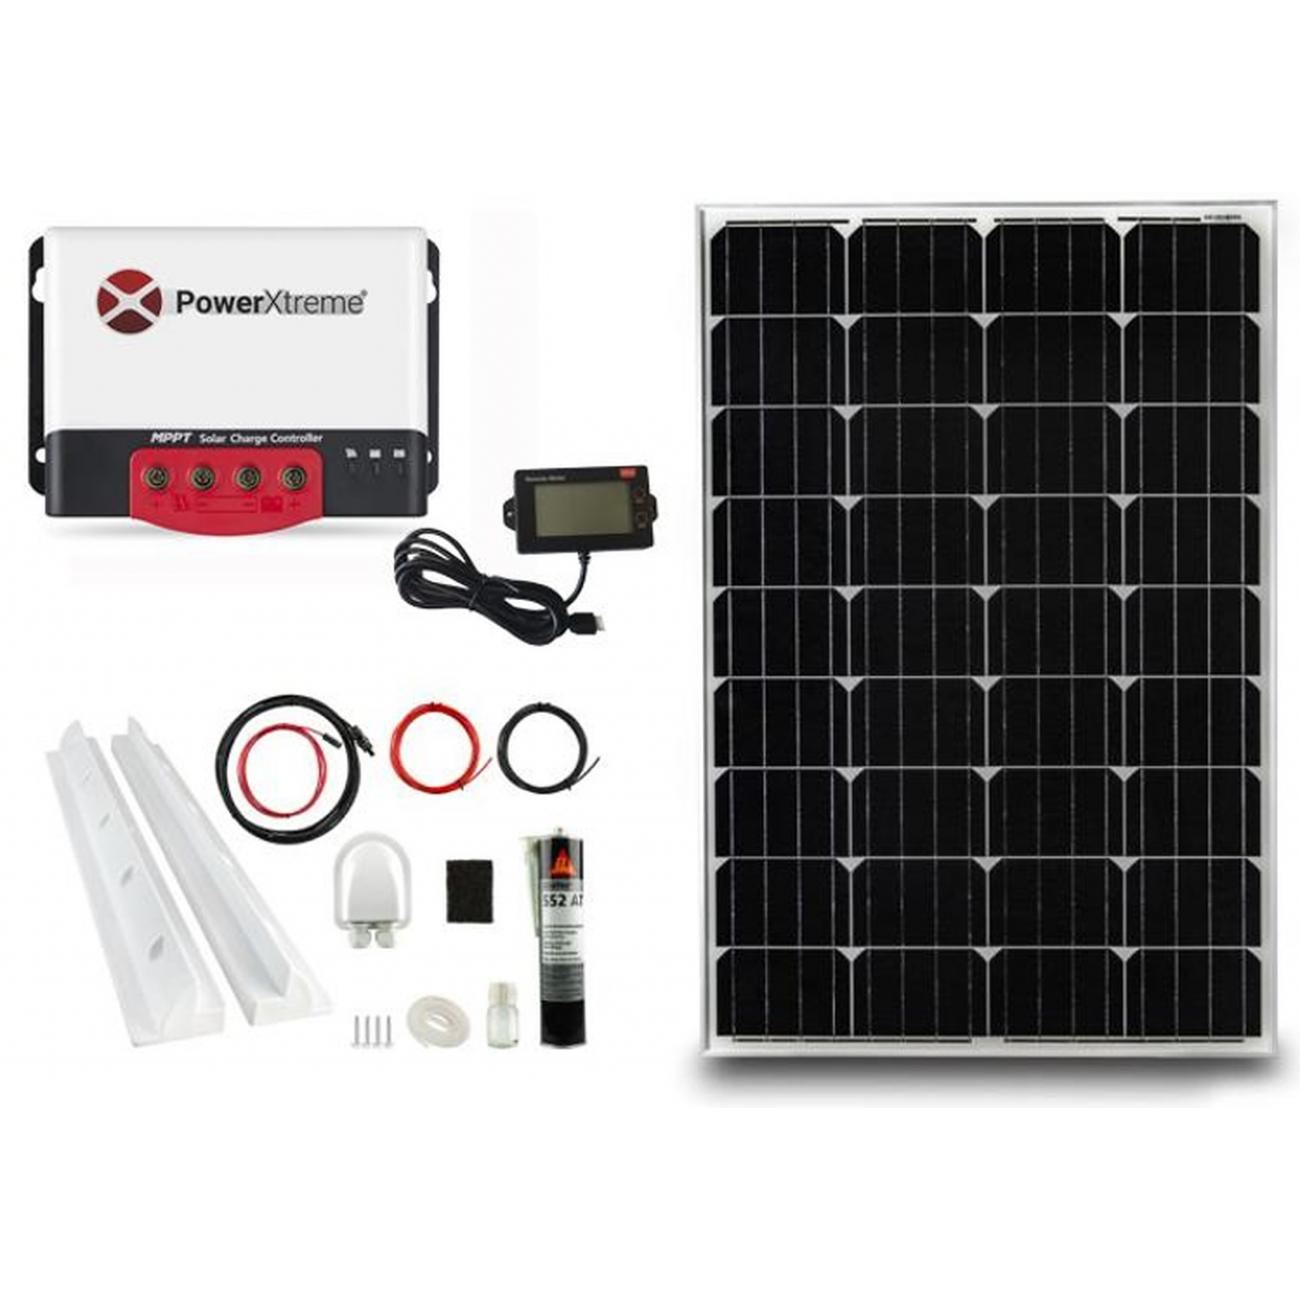 PowerXtreme XS20s Solar MPPT Met Display 130W Pakket